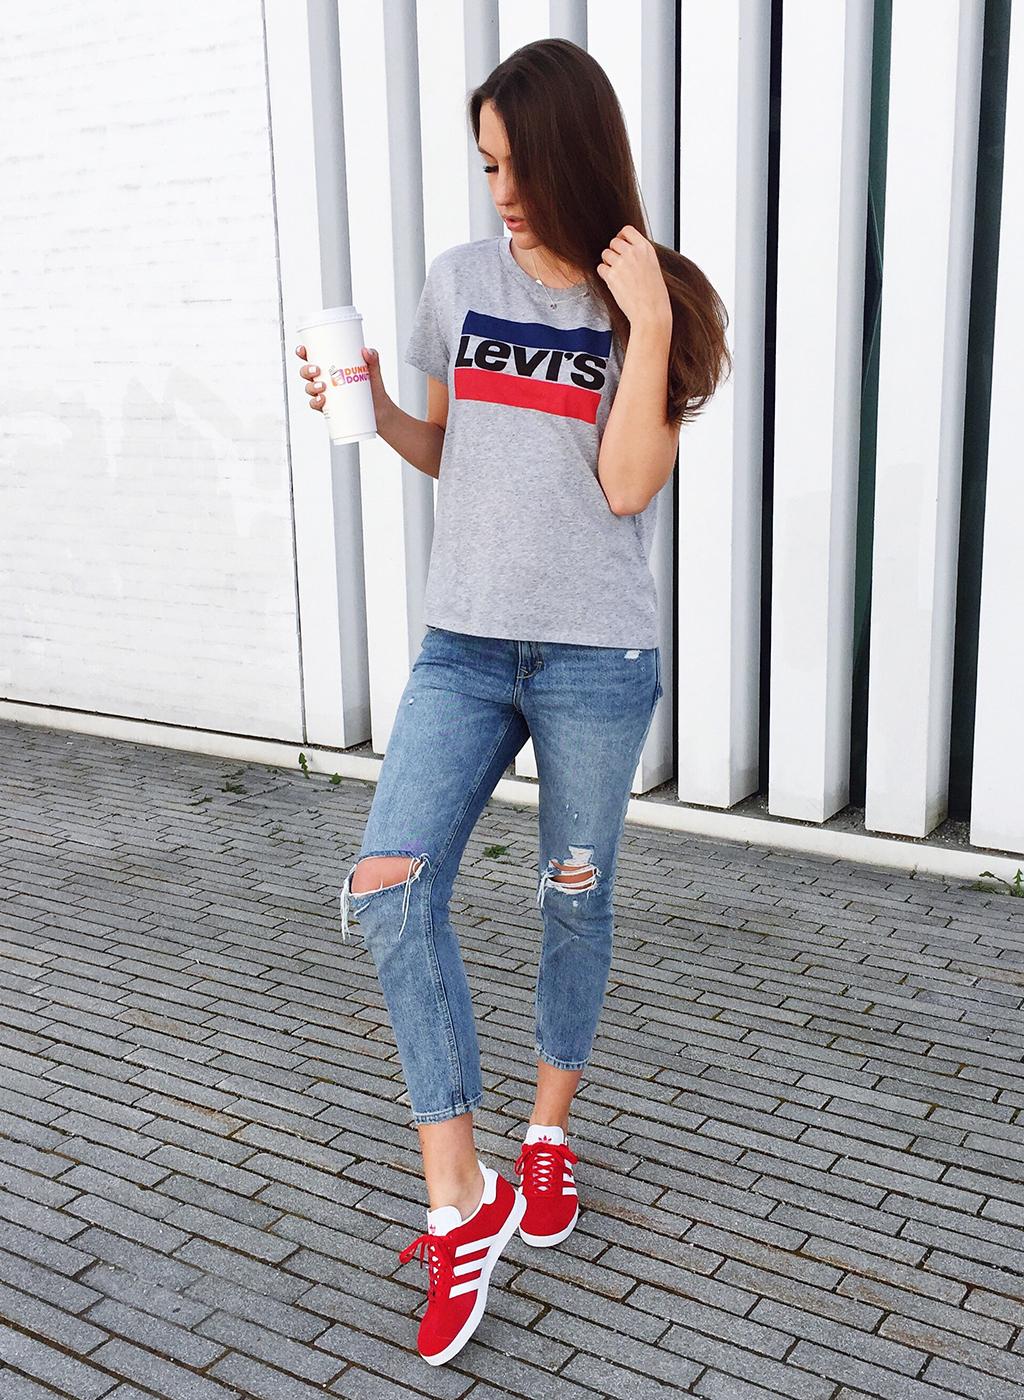 Levis Shirt Outfit